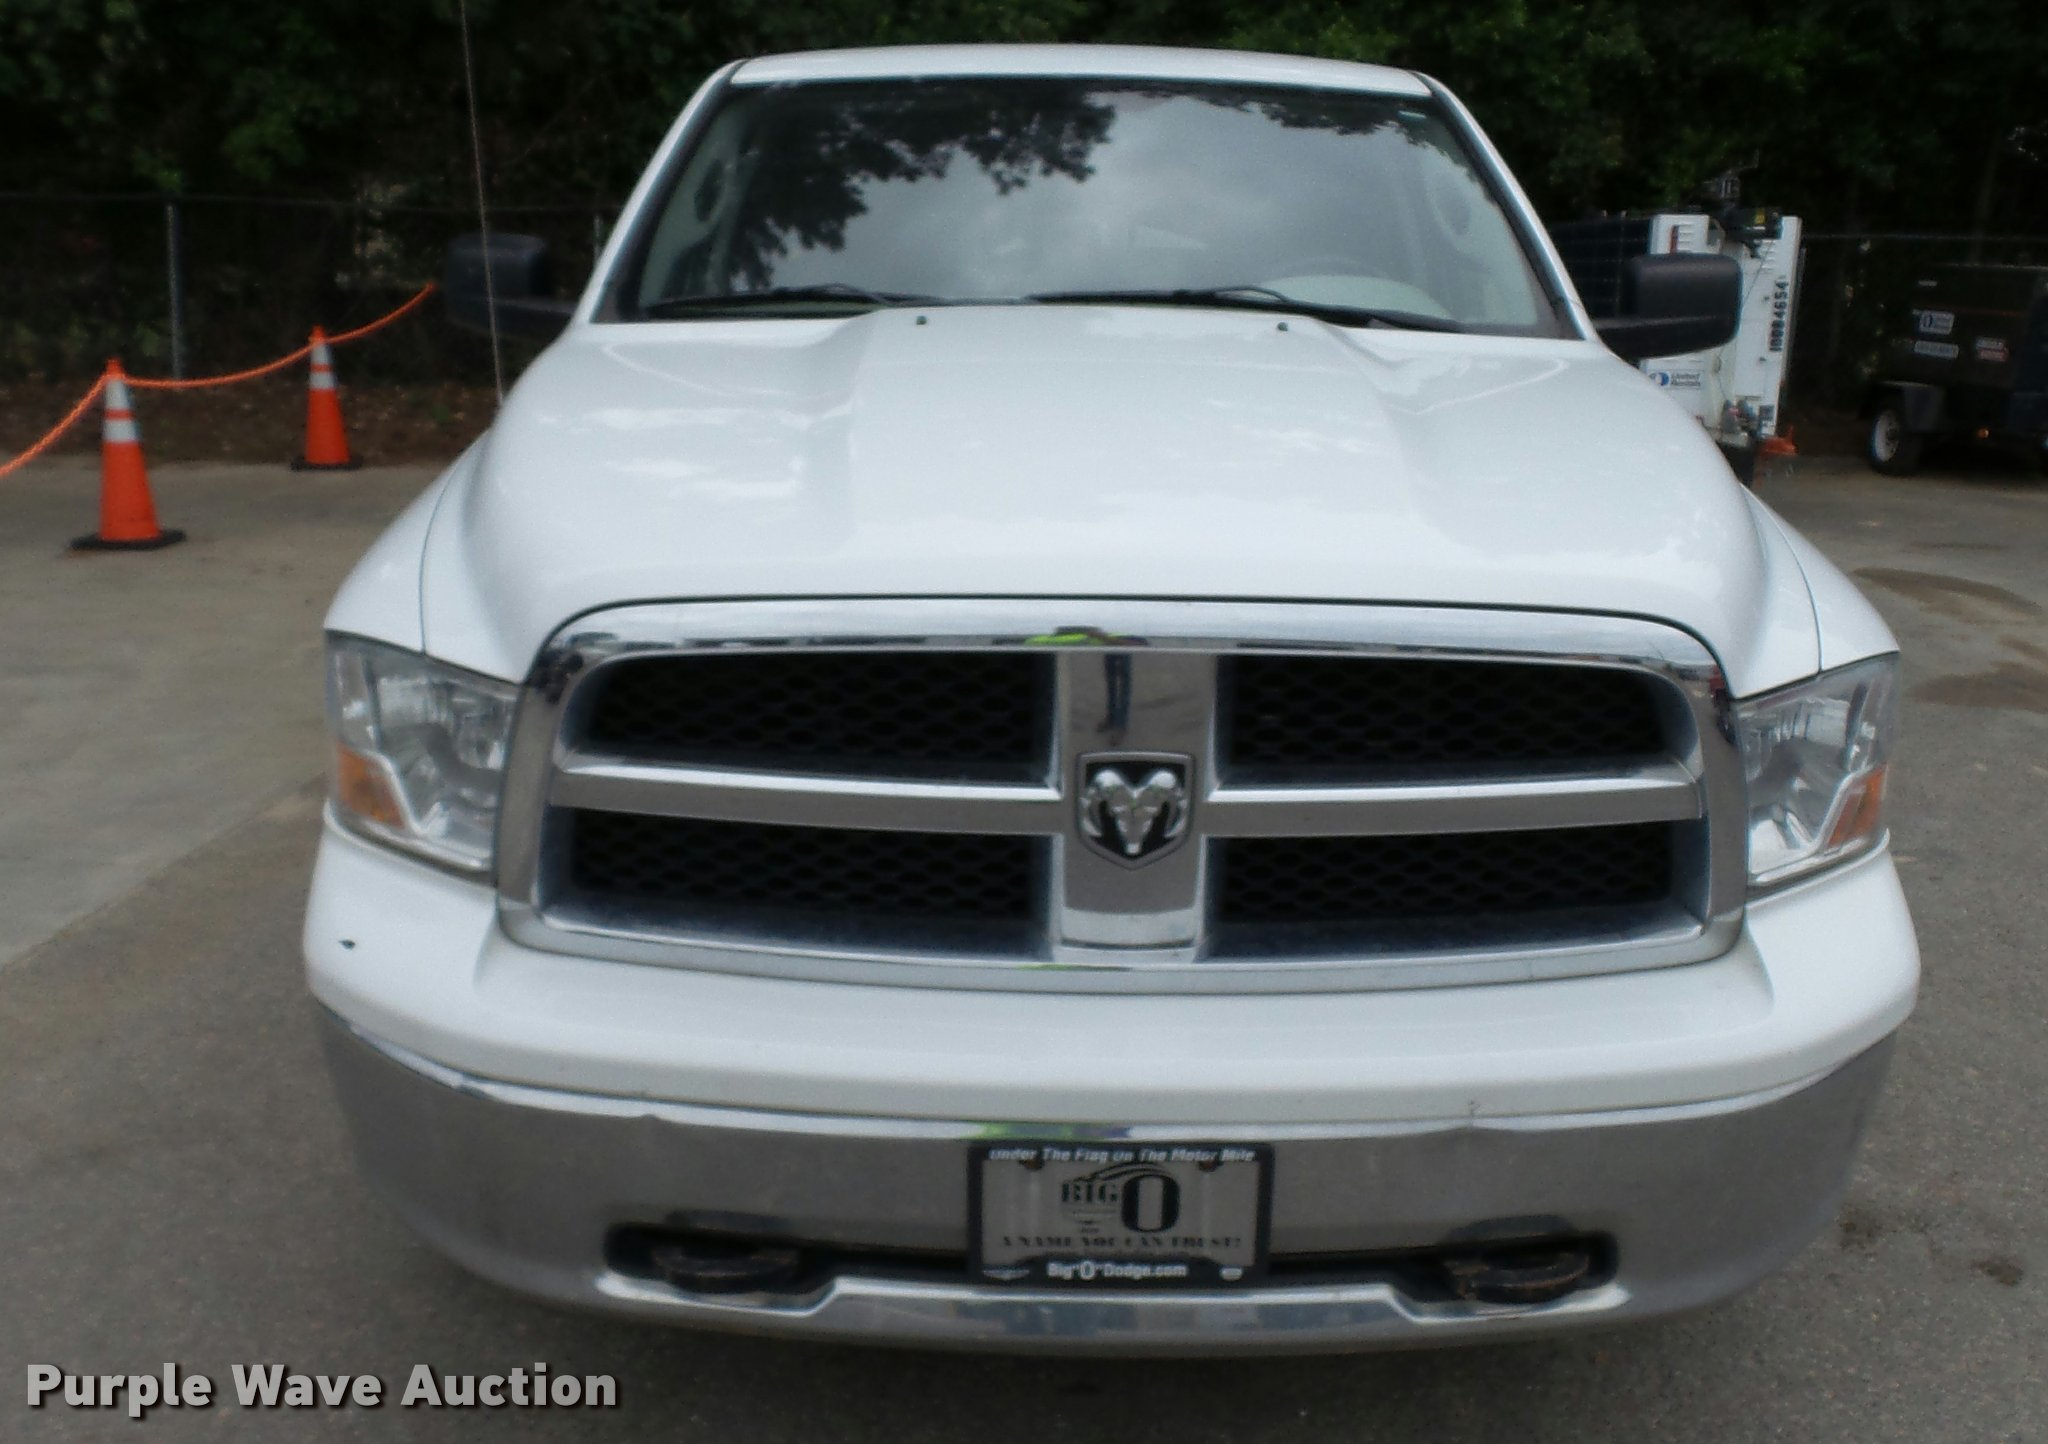 2011 Dodge Ram 1500 Quad Cab pickup truck Item DA1219